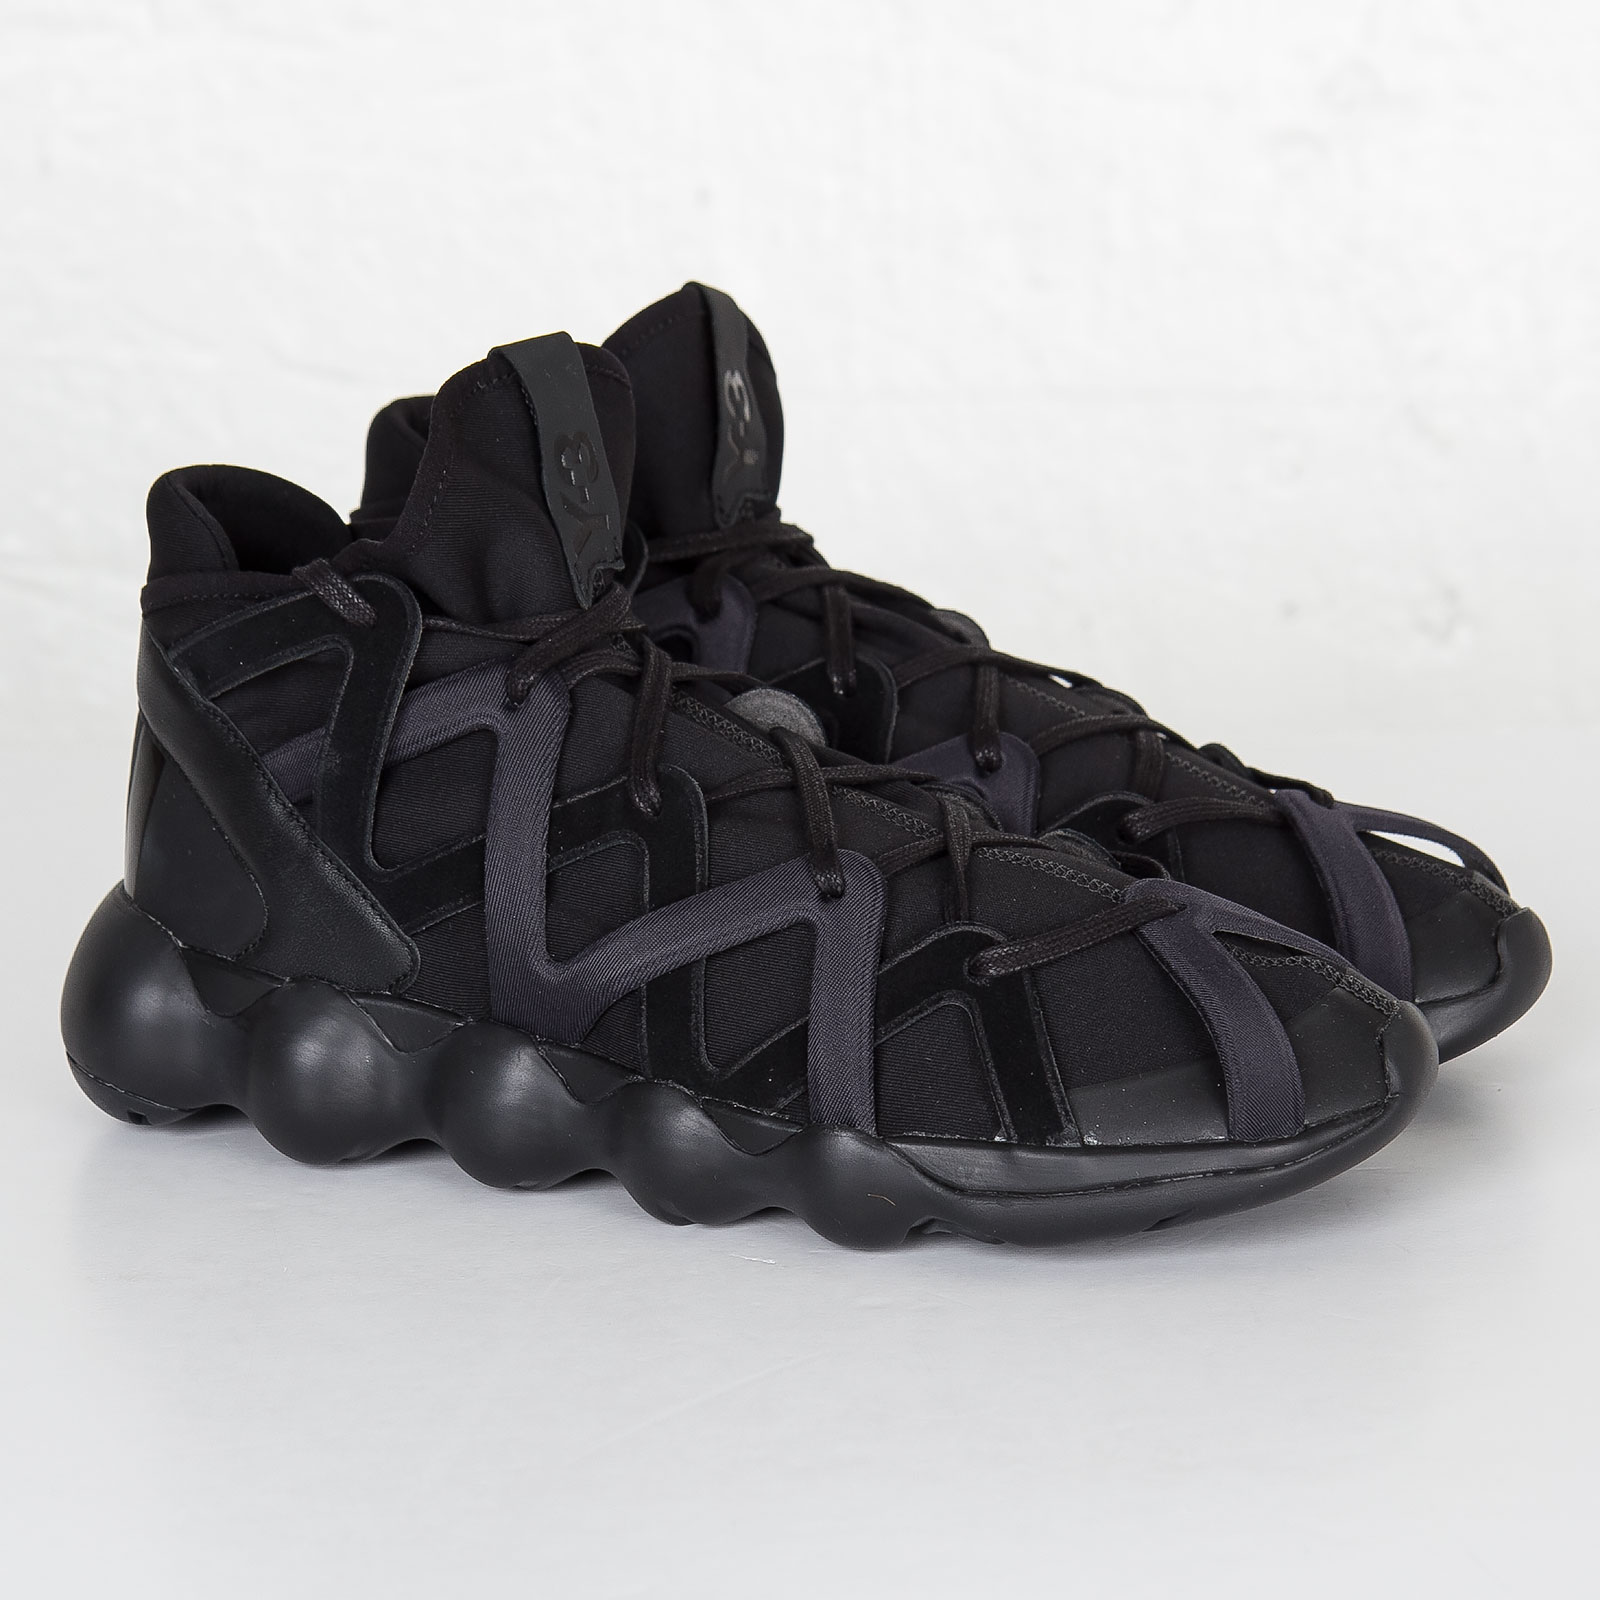 e0774acc1416 adidas Y-3 Kyujo High - Aq5545 - Sneakersnstuff